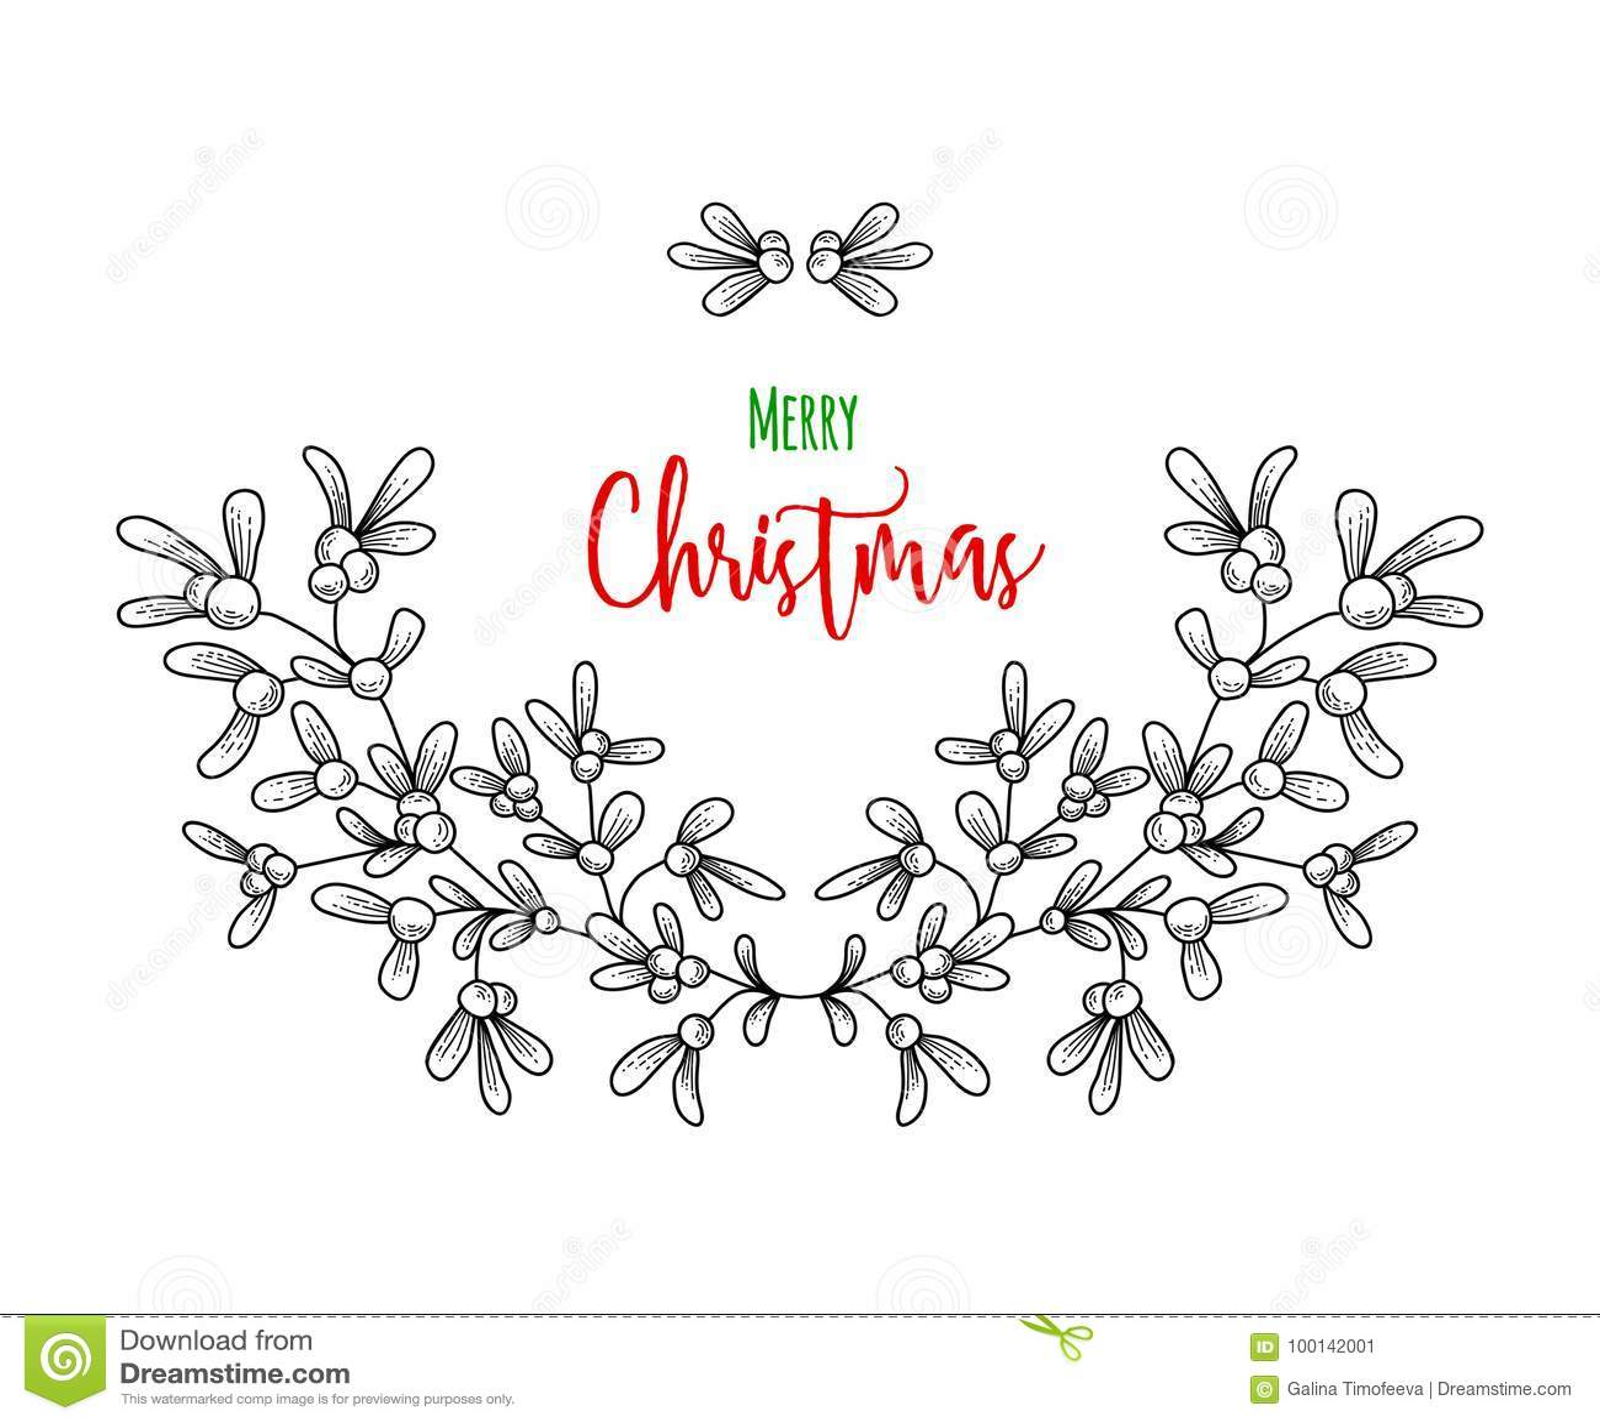 Christmas Sprig Of Mistletoe. Illustration For Greeting Cards ...